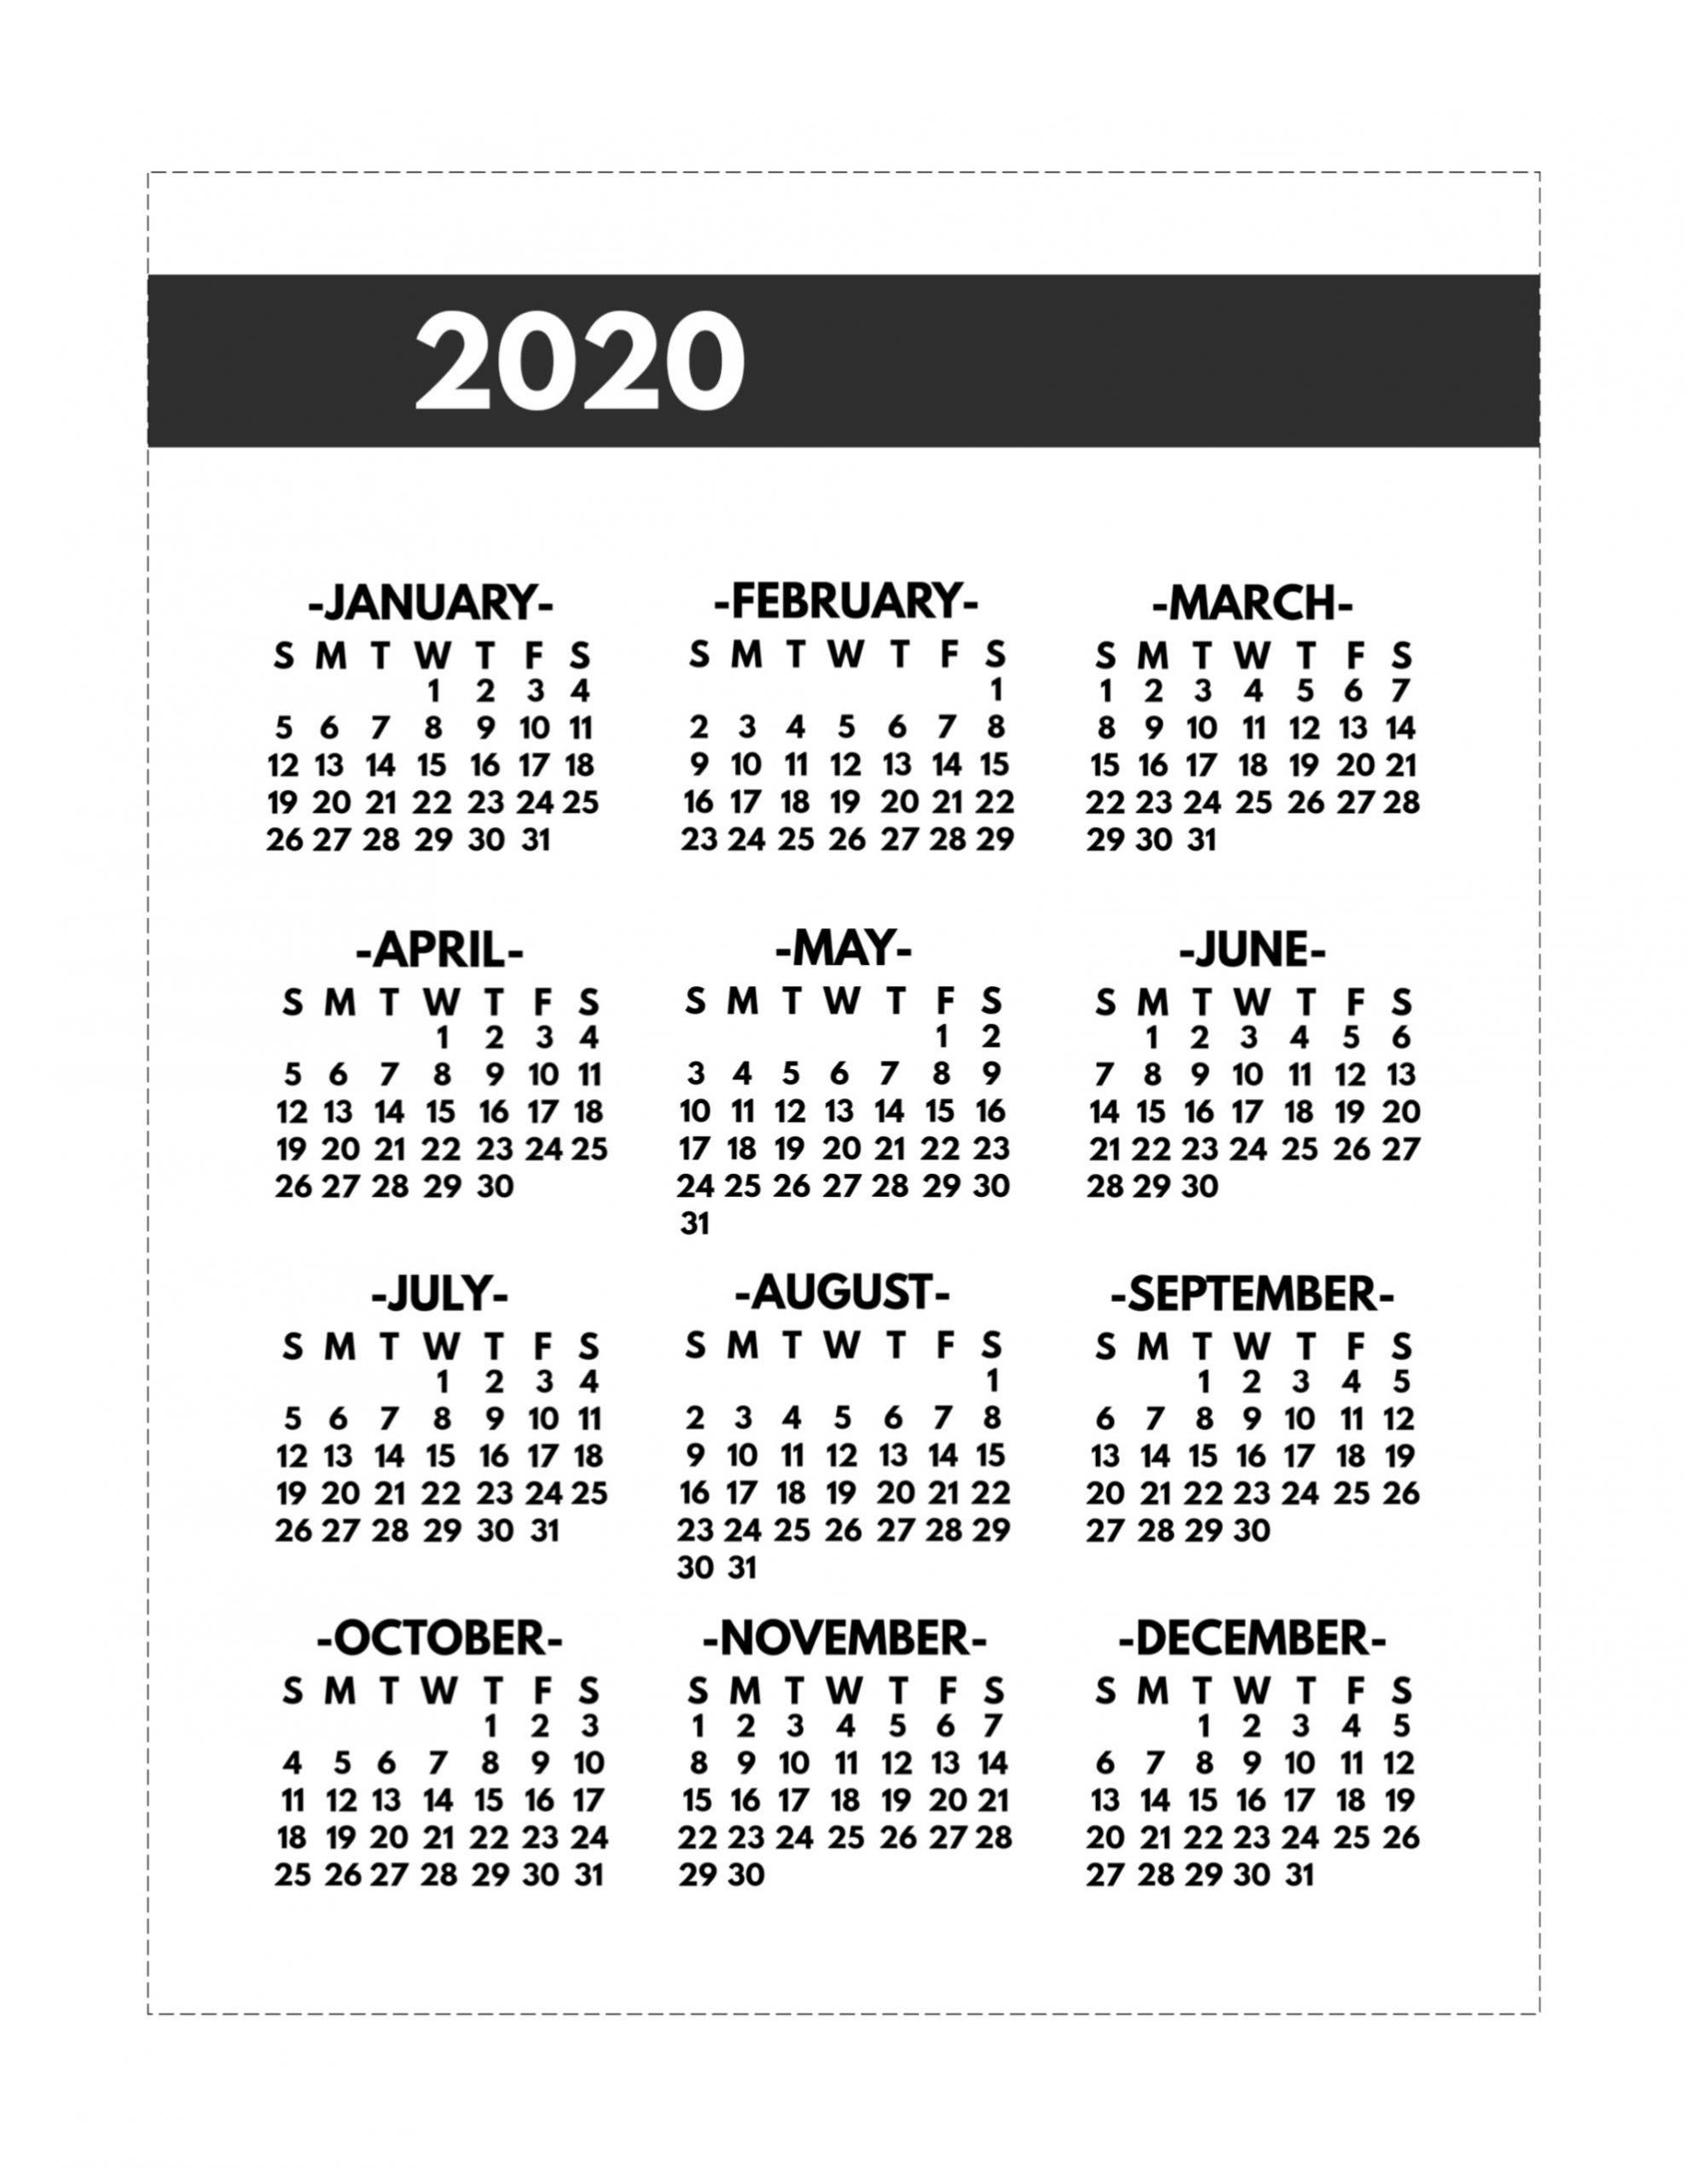 8.5 X 11 Calendar Template - Calendar Inspiration Design in Year At A Glance Calendar 2020 8.5 X 11